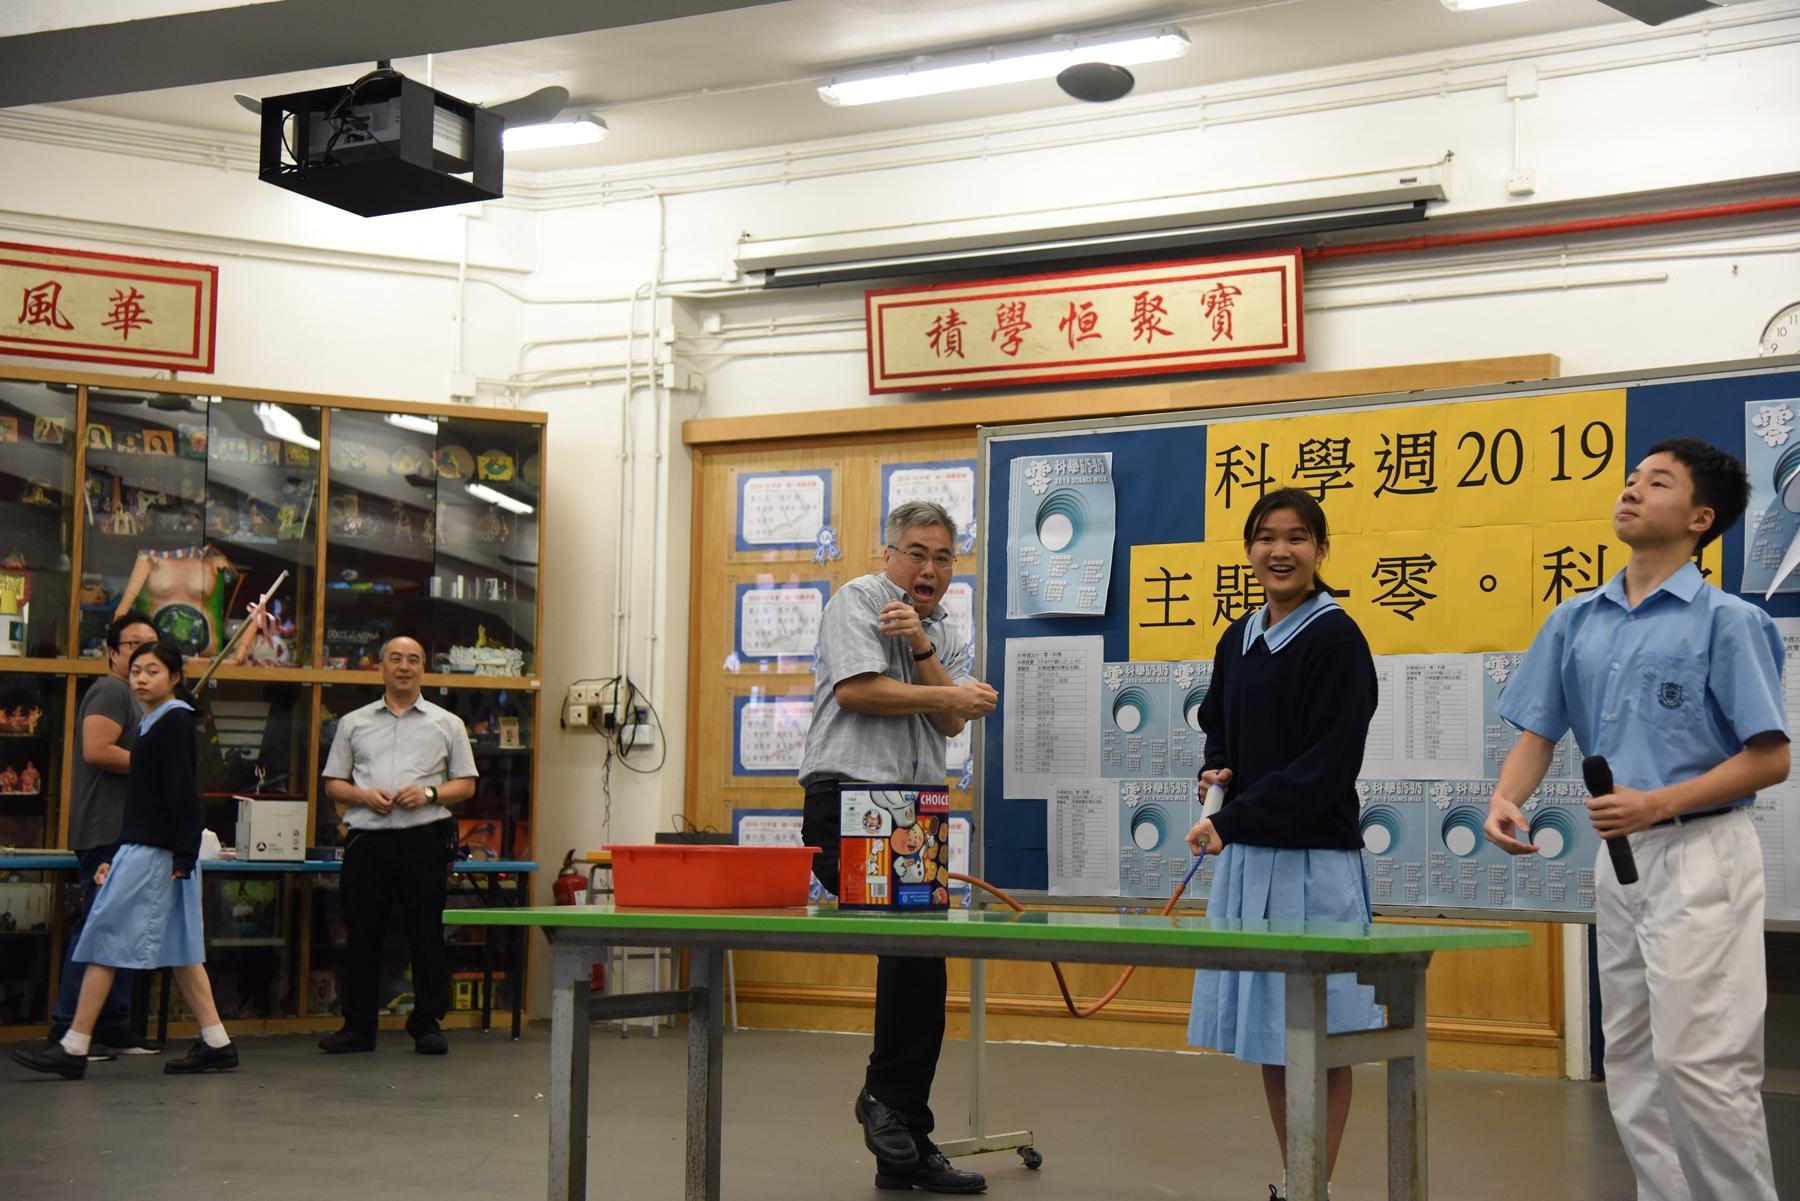 http://npc.edu.hk/sites/default/files/dsc_9472.jpg